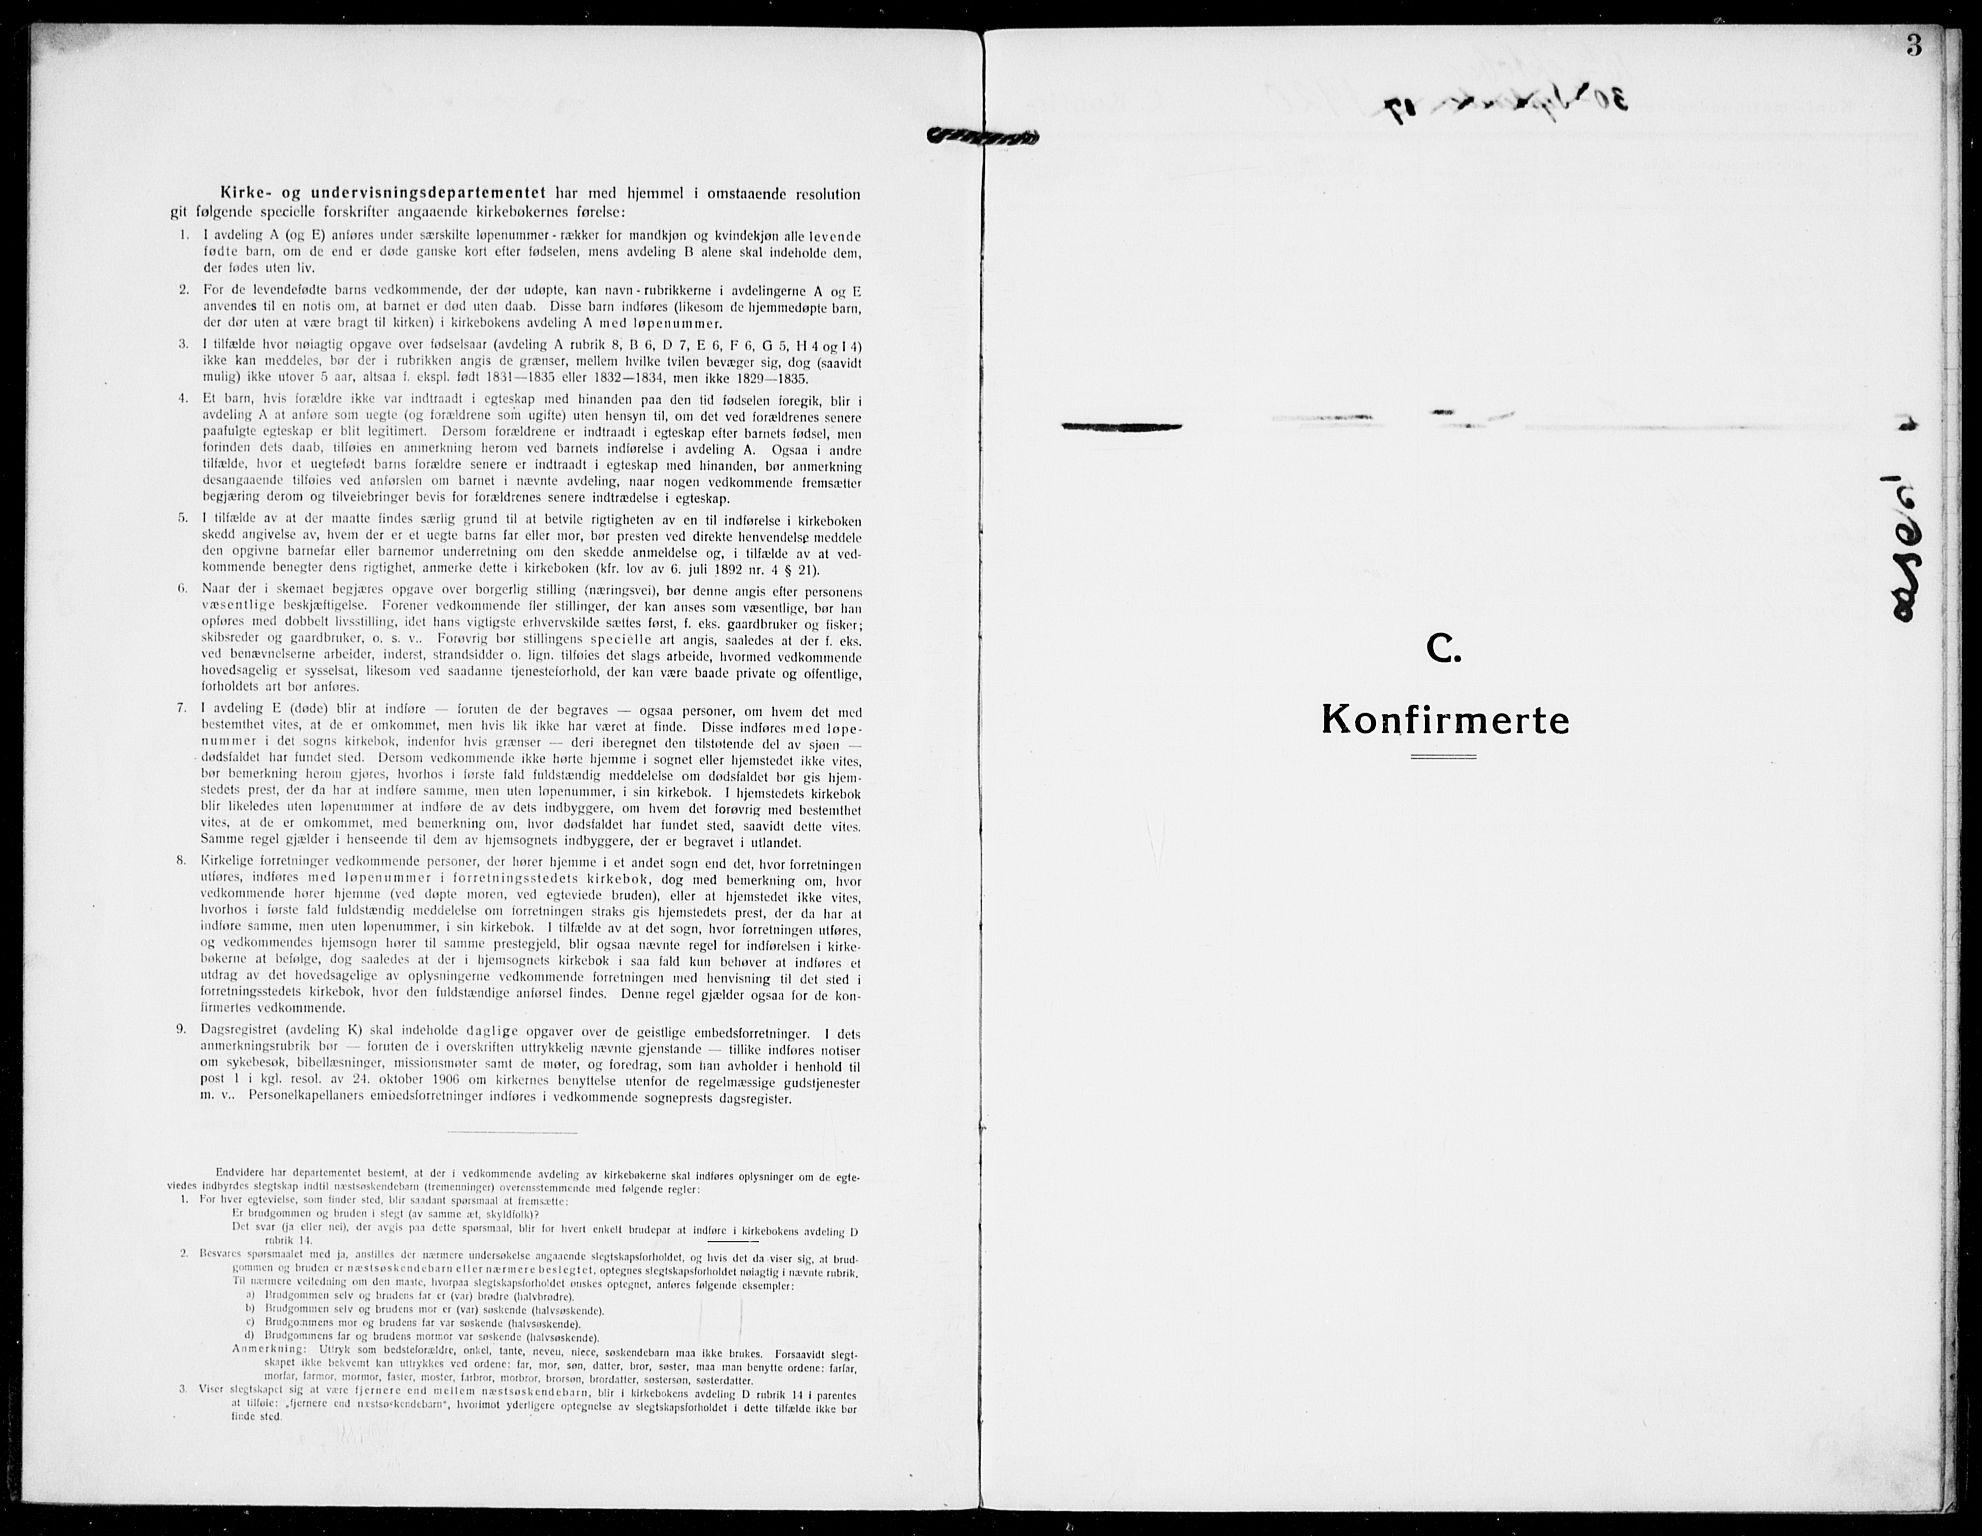 SAKO, Hjartdal kirkebøker, F/Fb/L0003: Ministerialbok nr. II 3, 1920-1932, s. 3